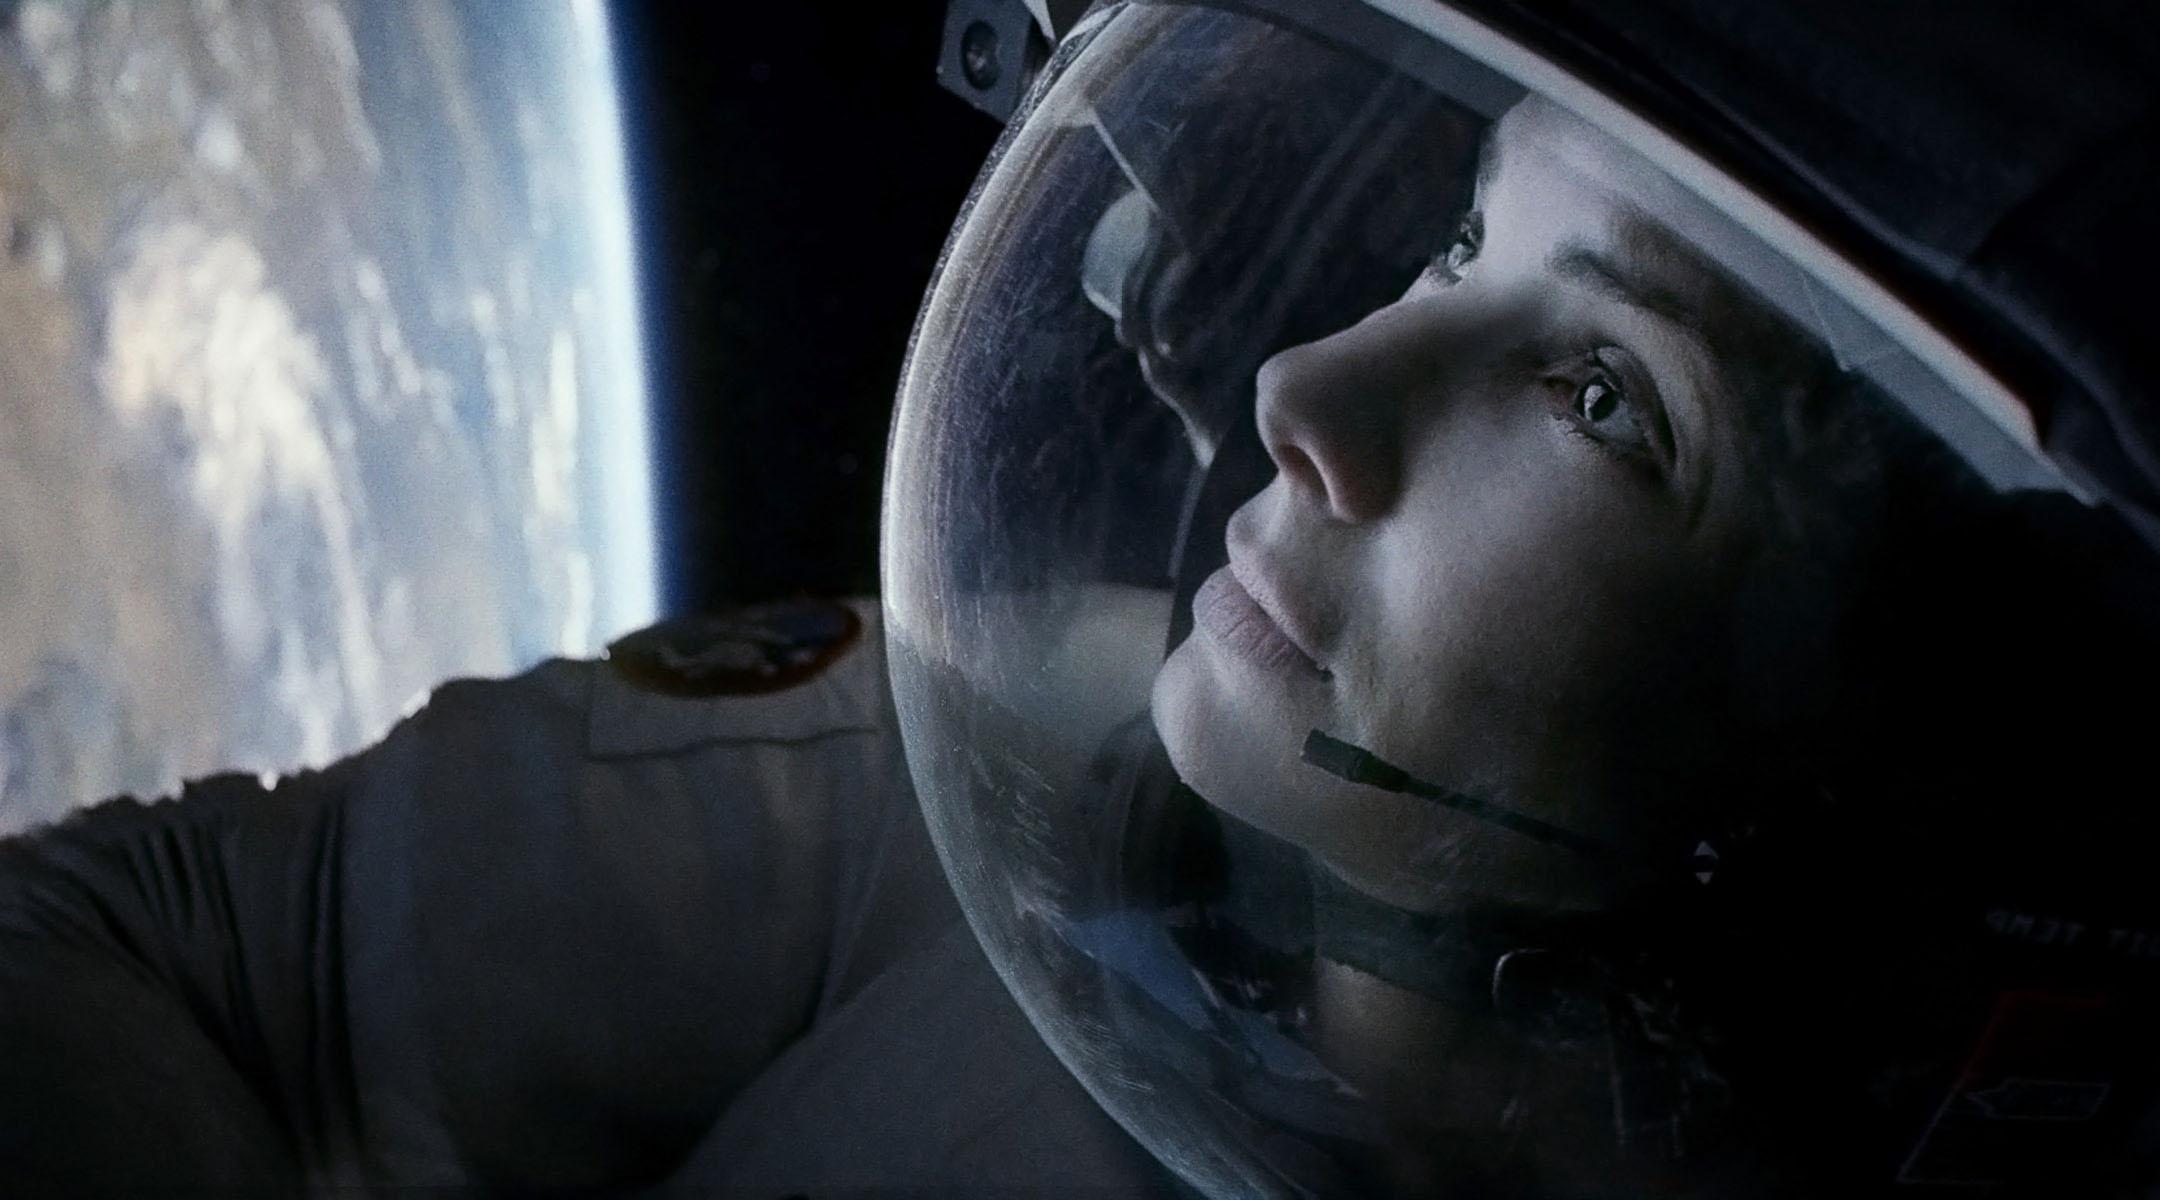 Звёздное небо и космос в картинках - Страница 12 5c46aa4447964cb3907ca14f43e5